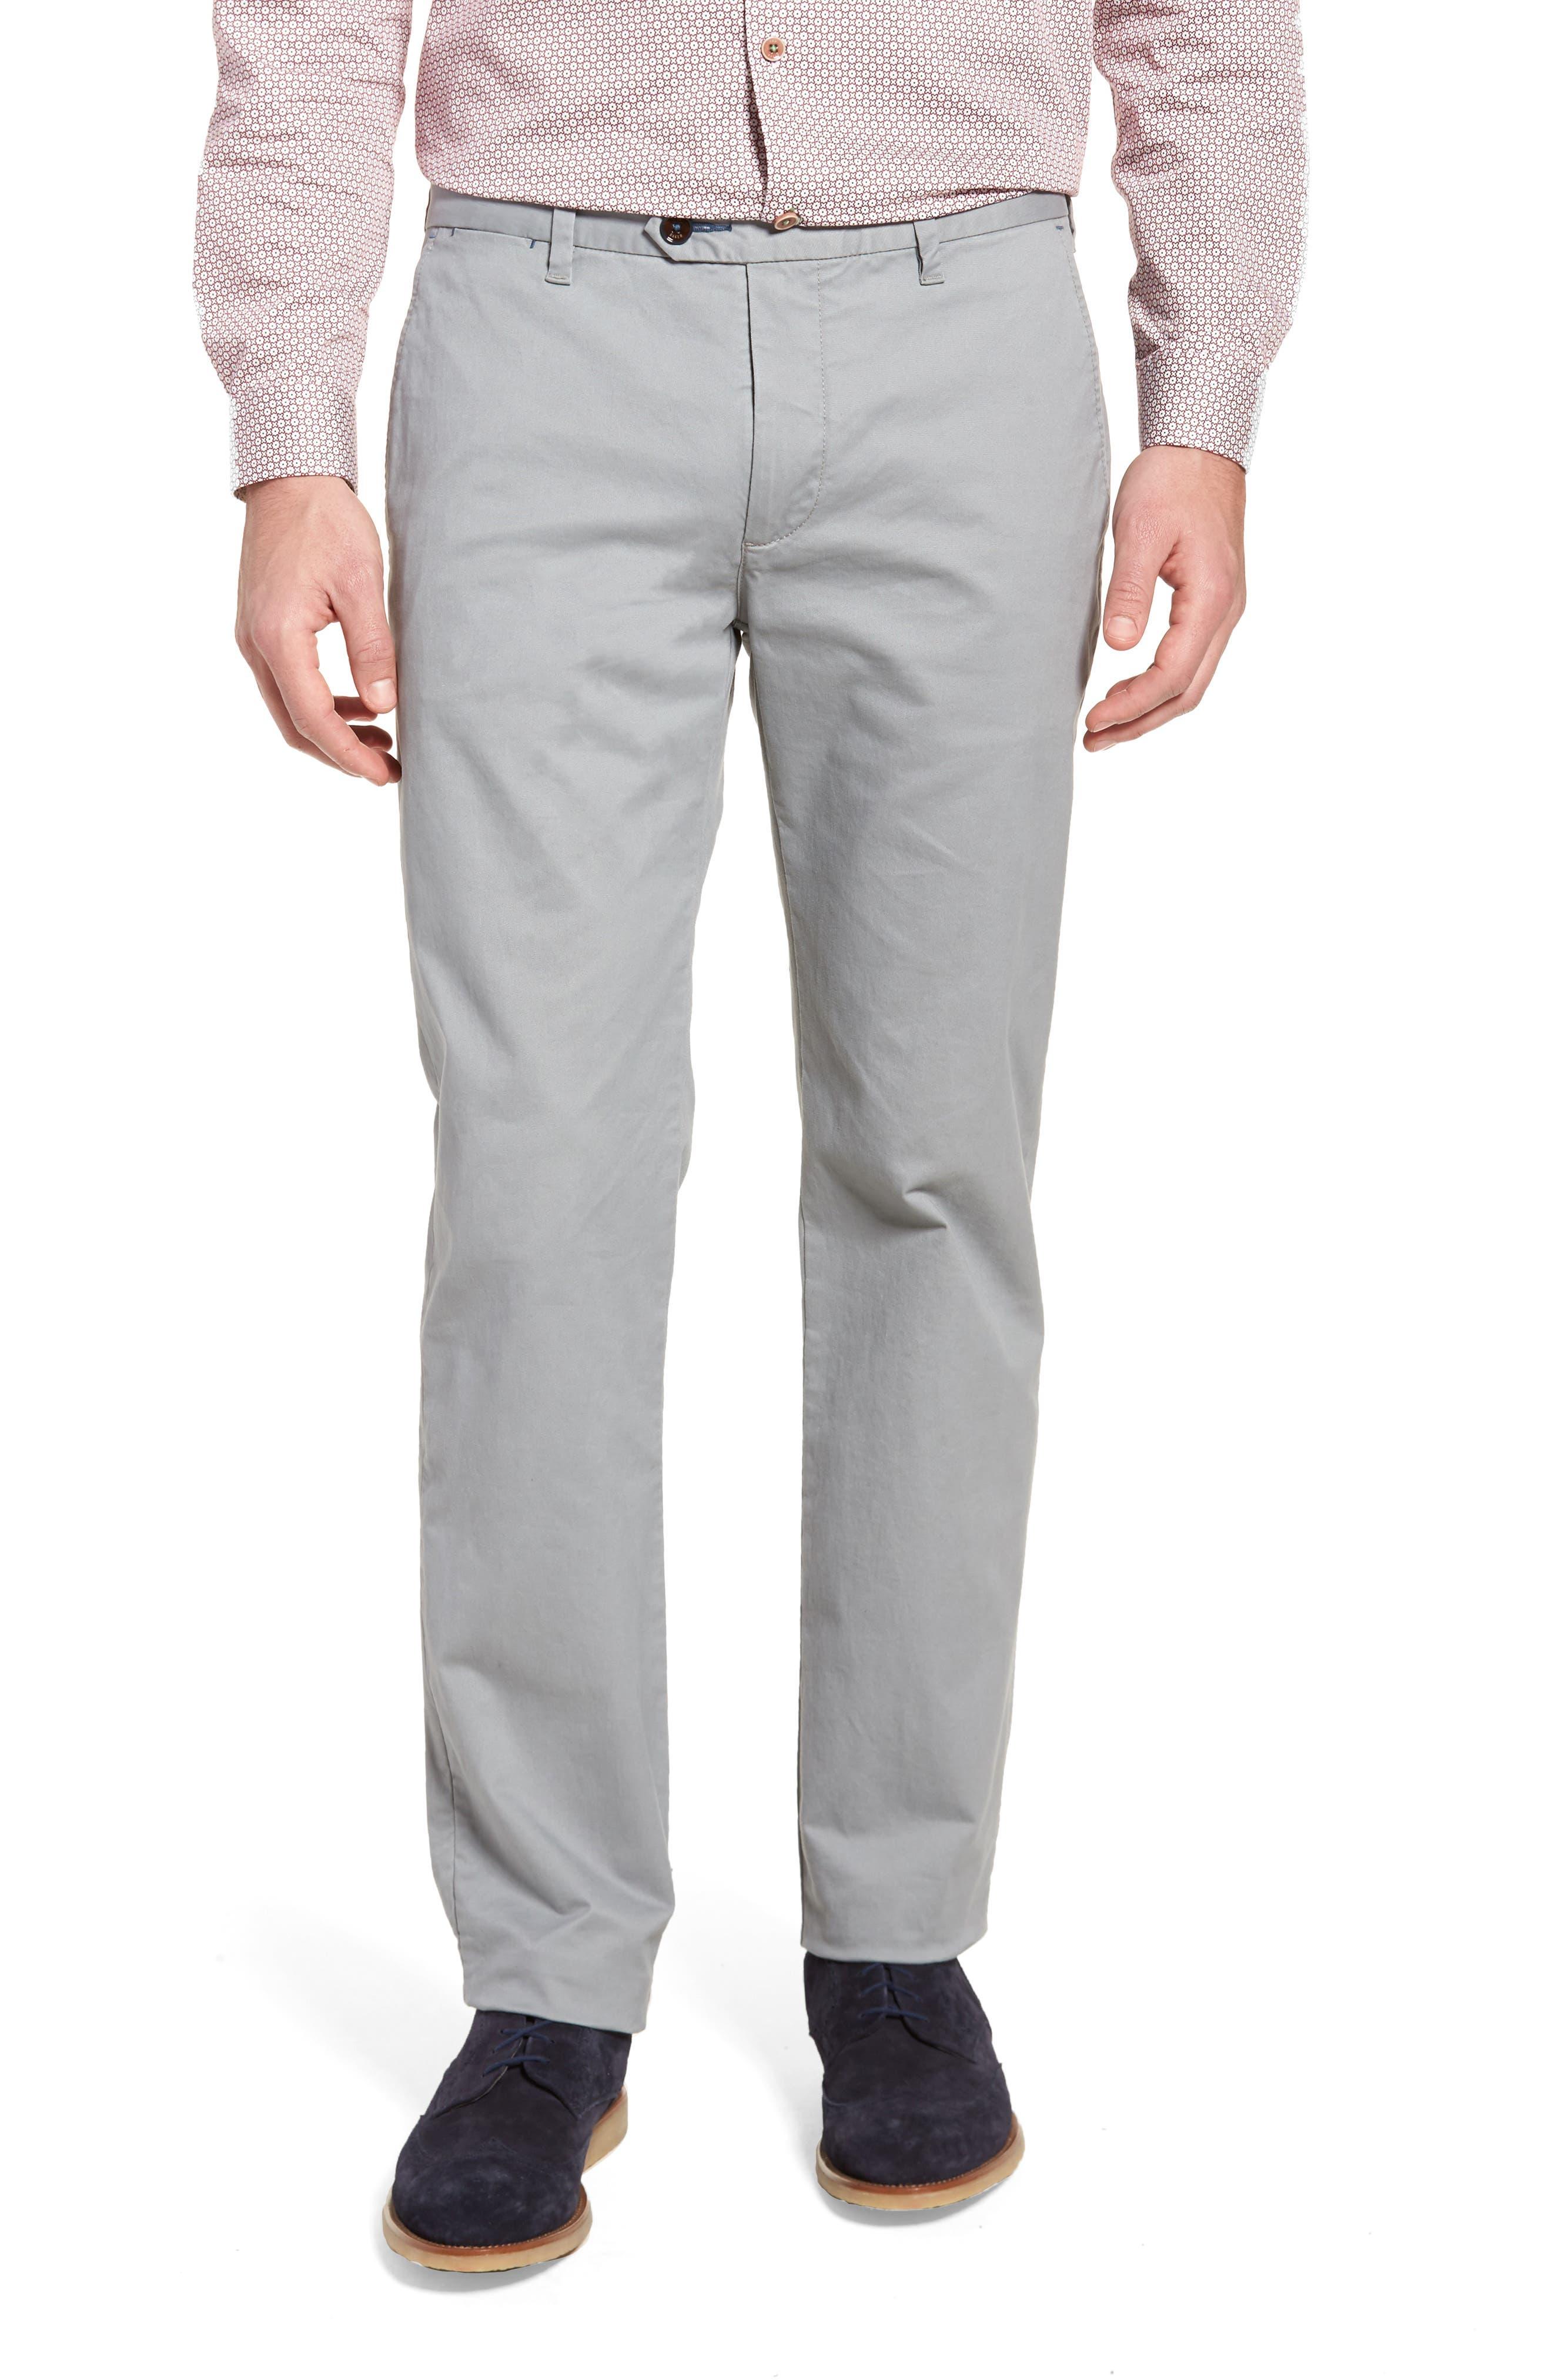 Proctt Flat Front Stretch Solid Cotton Pants,                             Main thumbnail 1, color,                             Light Grey